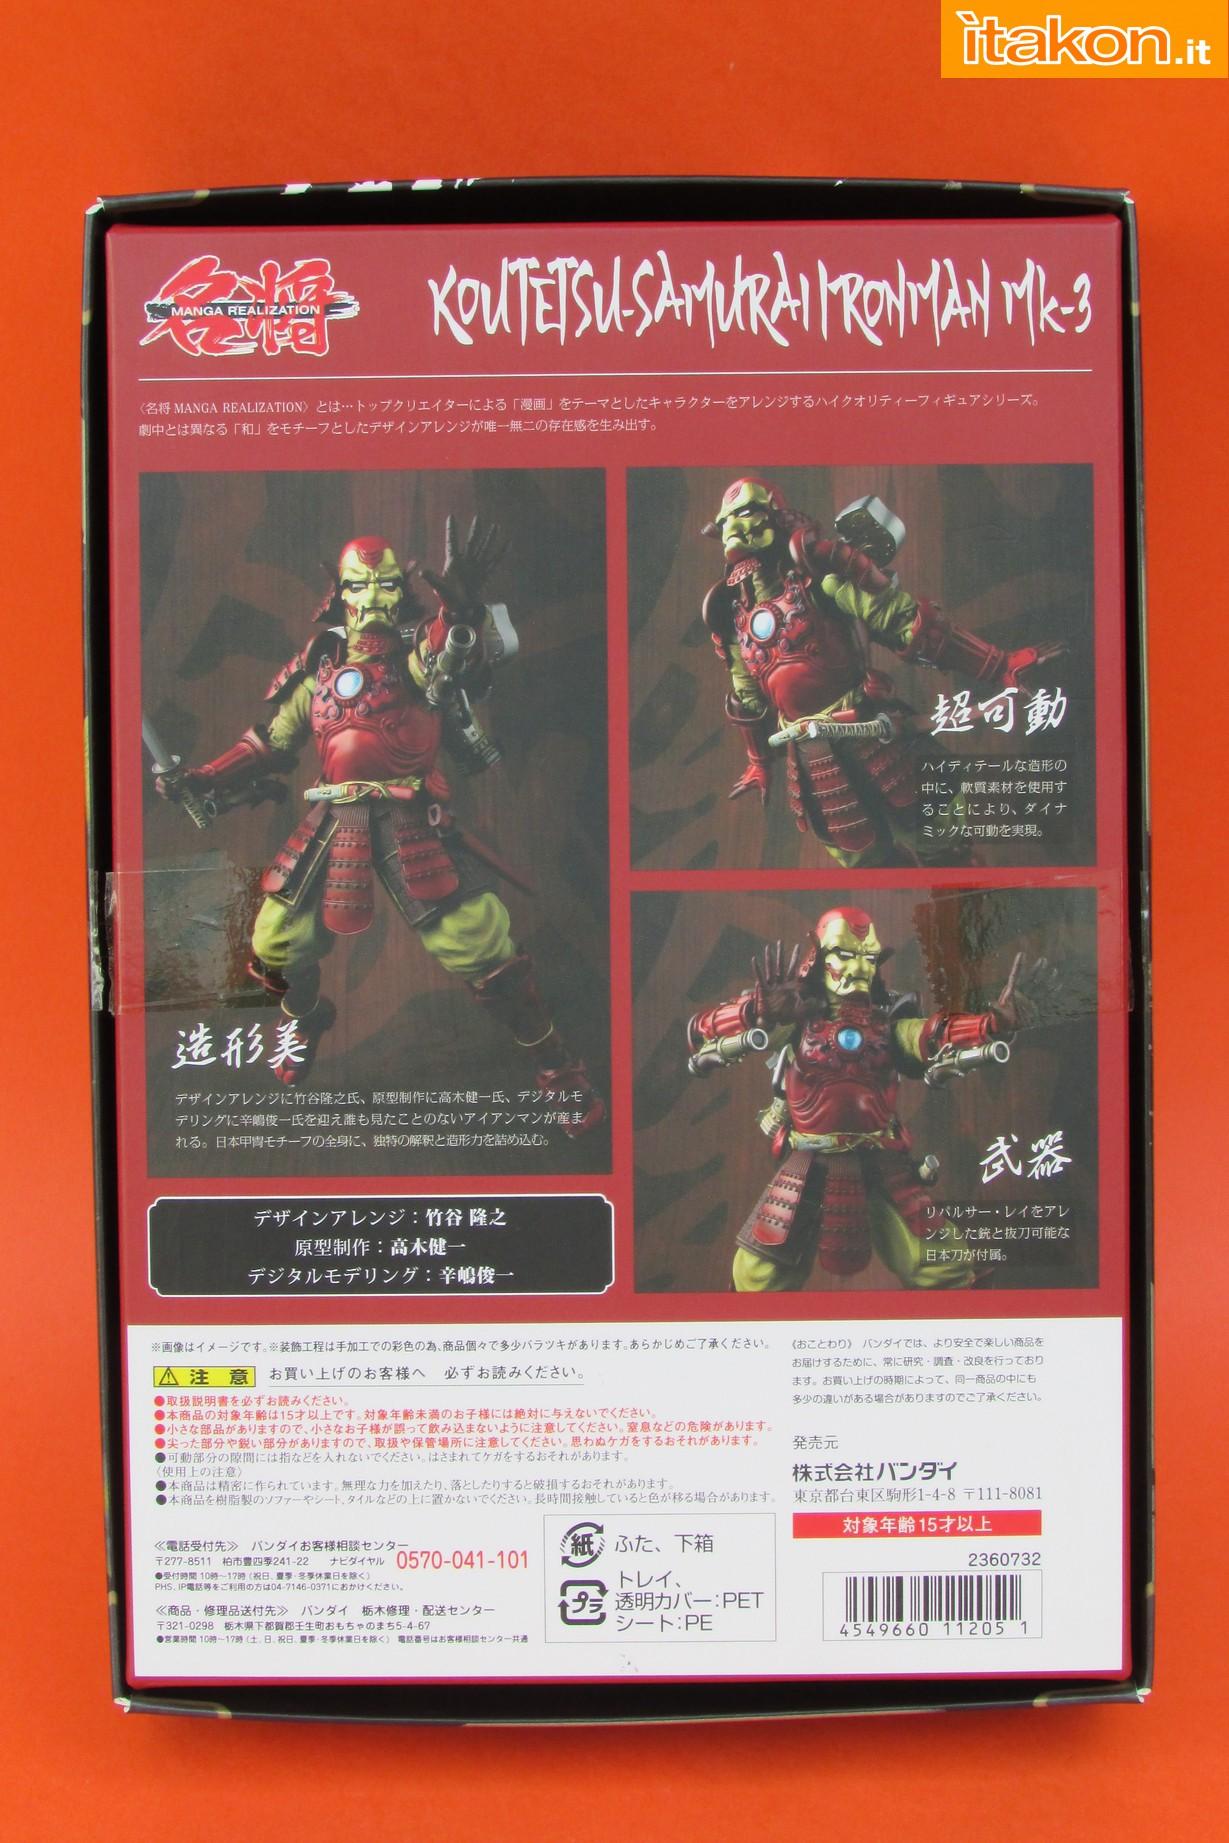 Link a Marvel Comics Koutetsu Samurai Iron Man Mark 3 Meishou MANGA REALIZATION review Bandai Itakon.it02